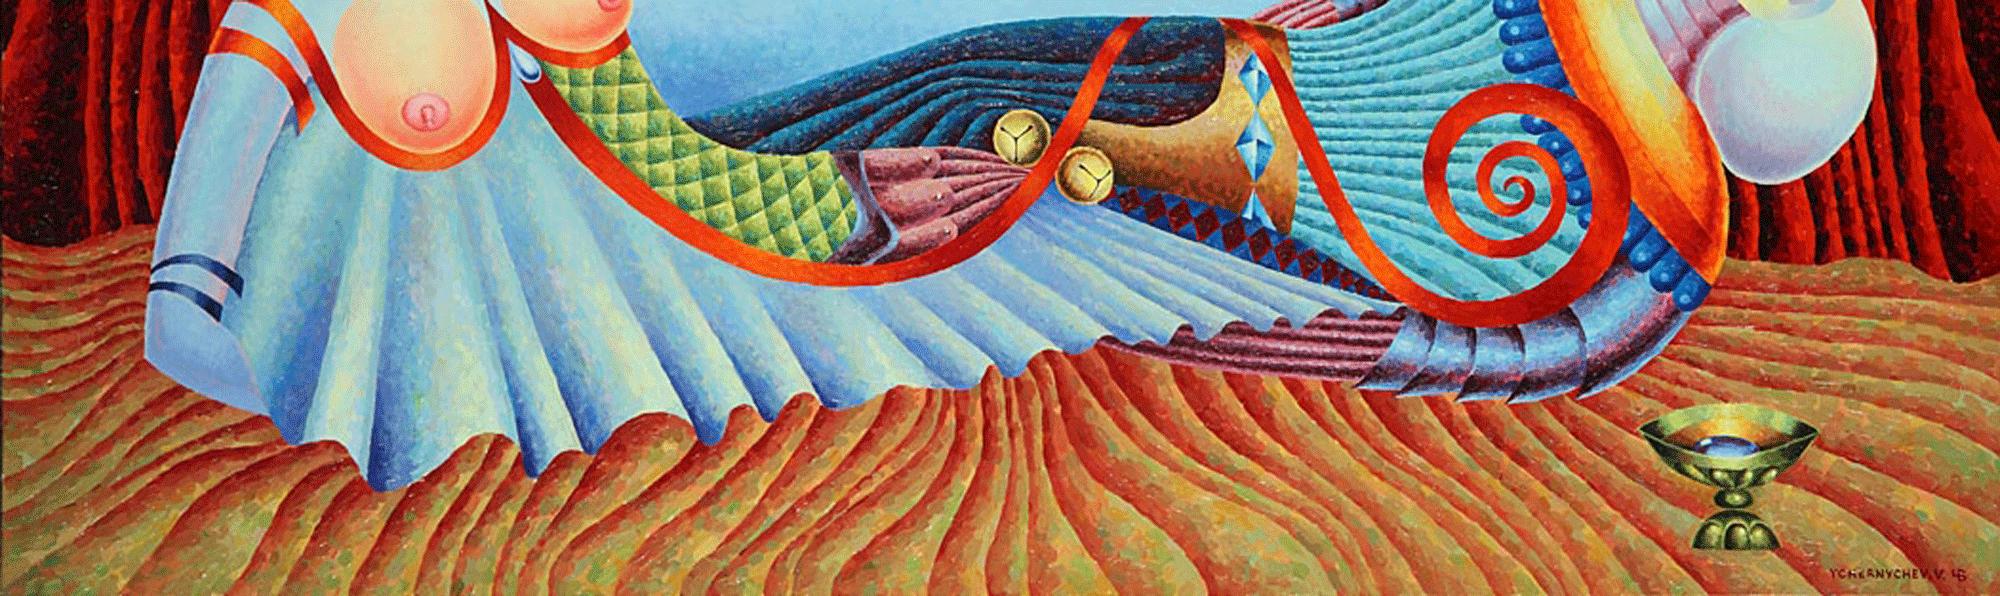 L'univers de Tchernychev